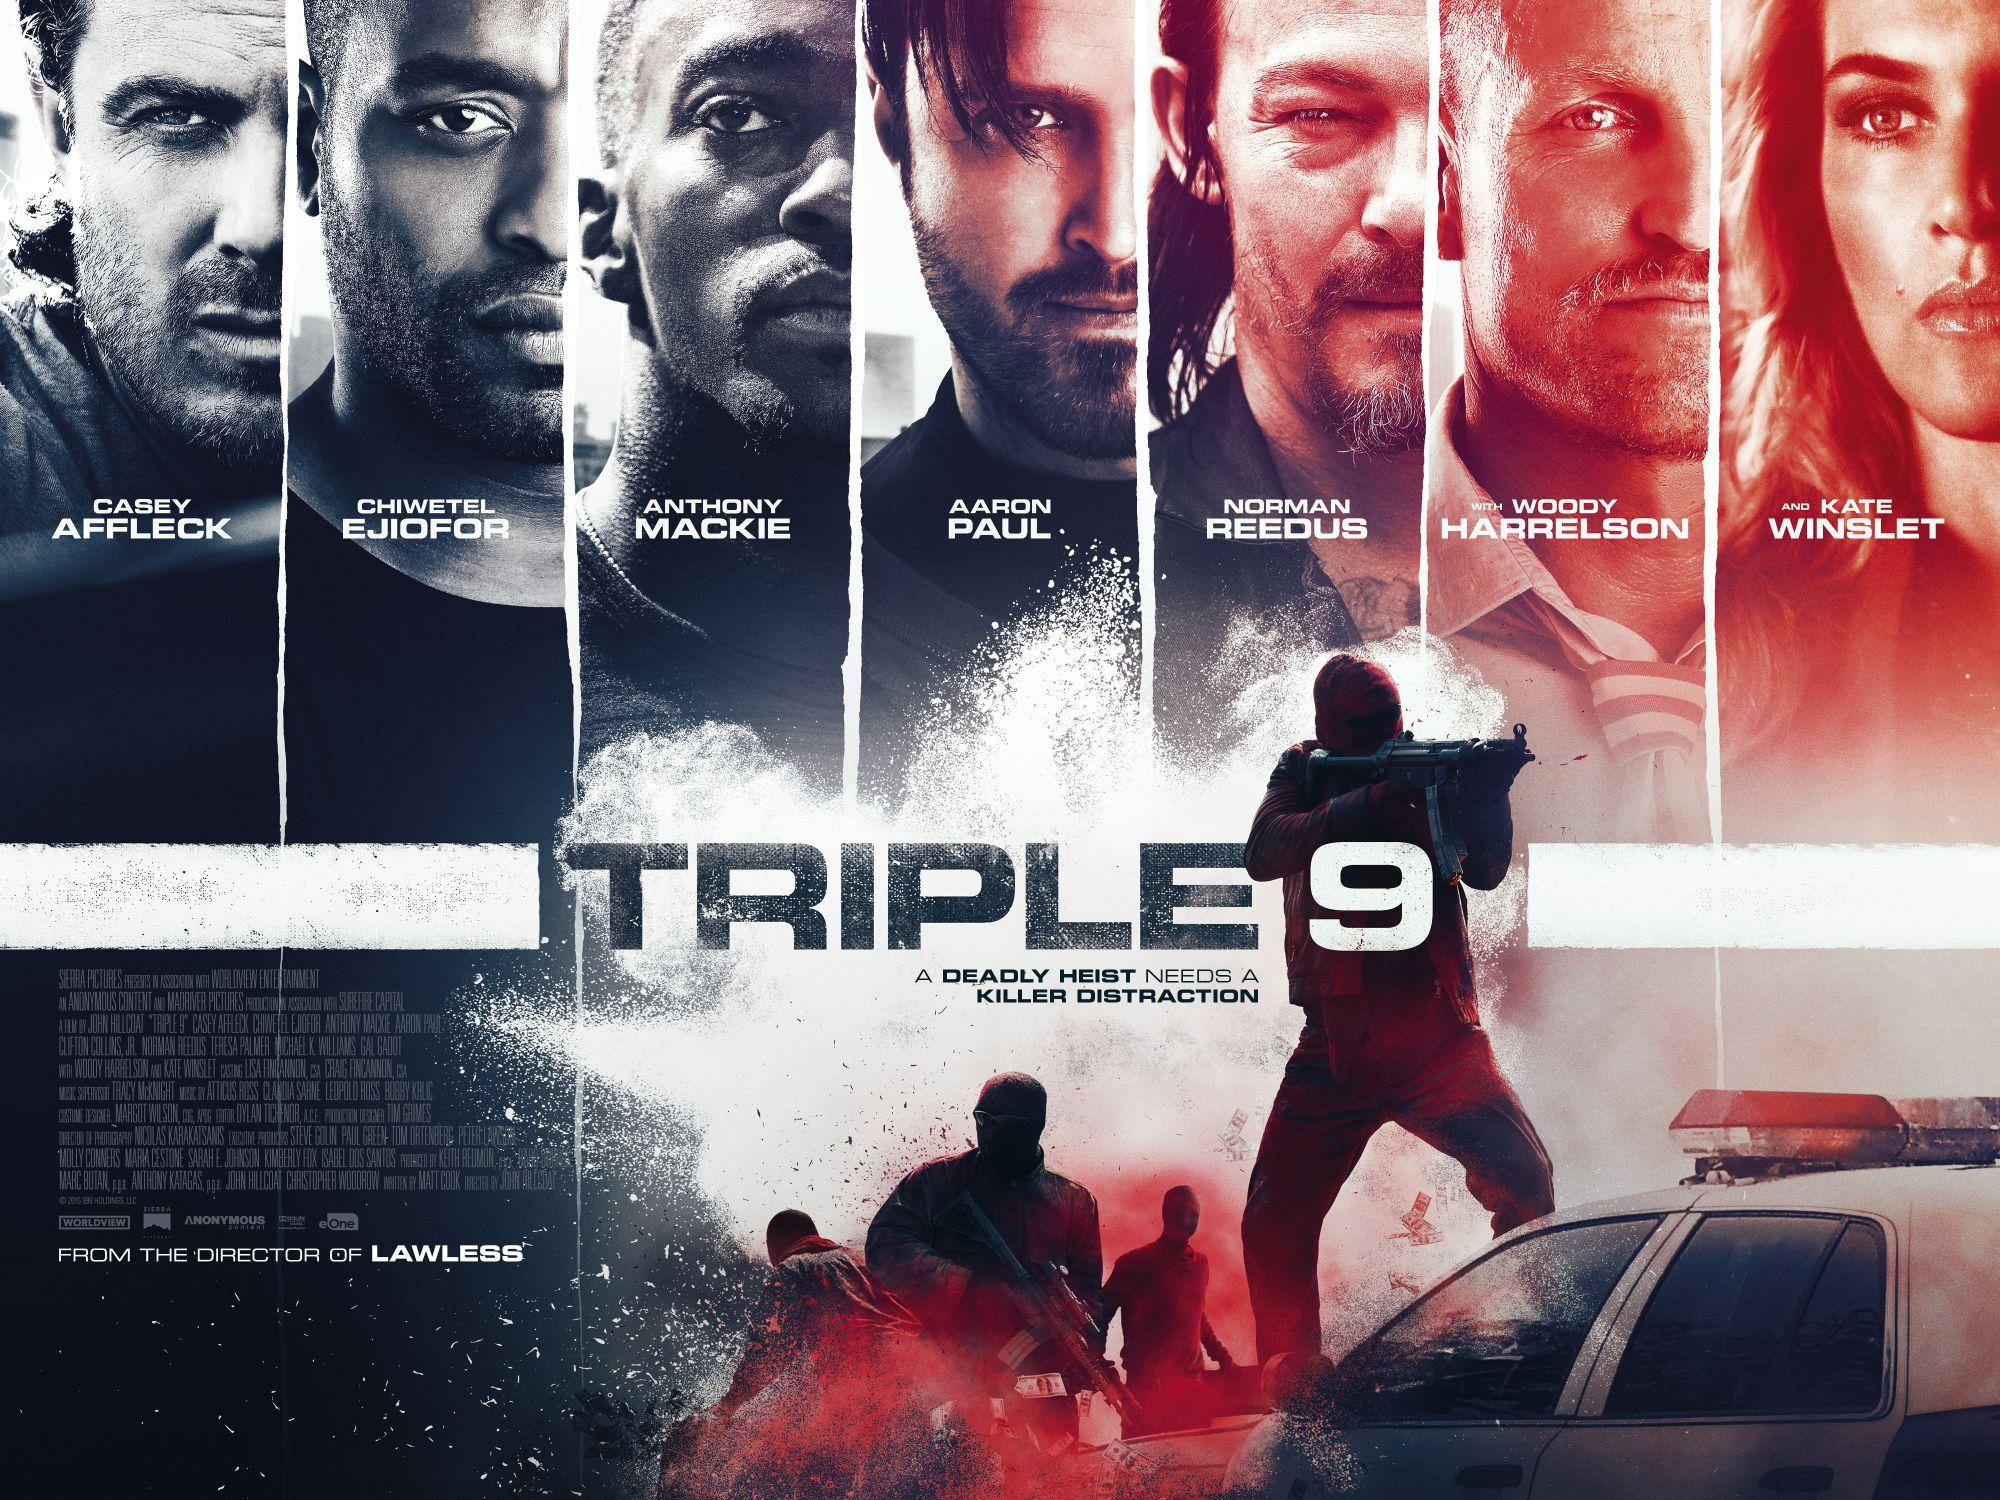 triple 9 movie poster wallpaper 52773